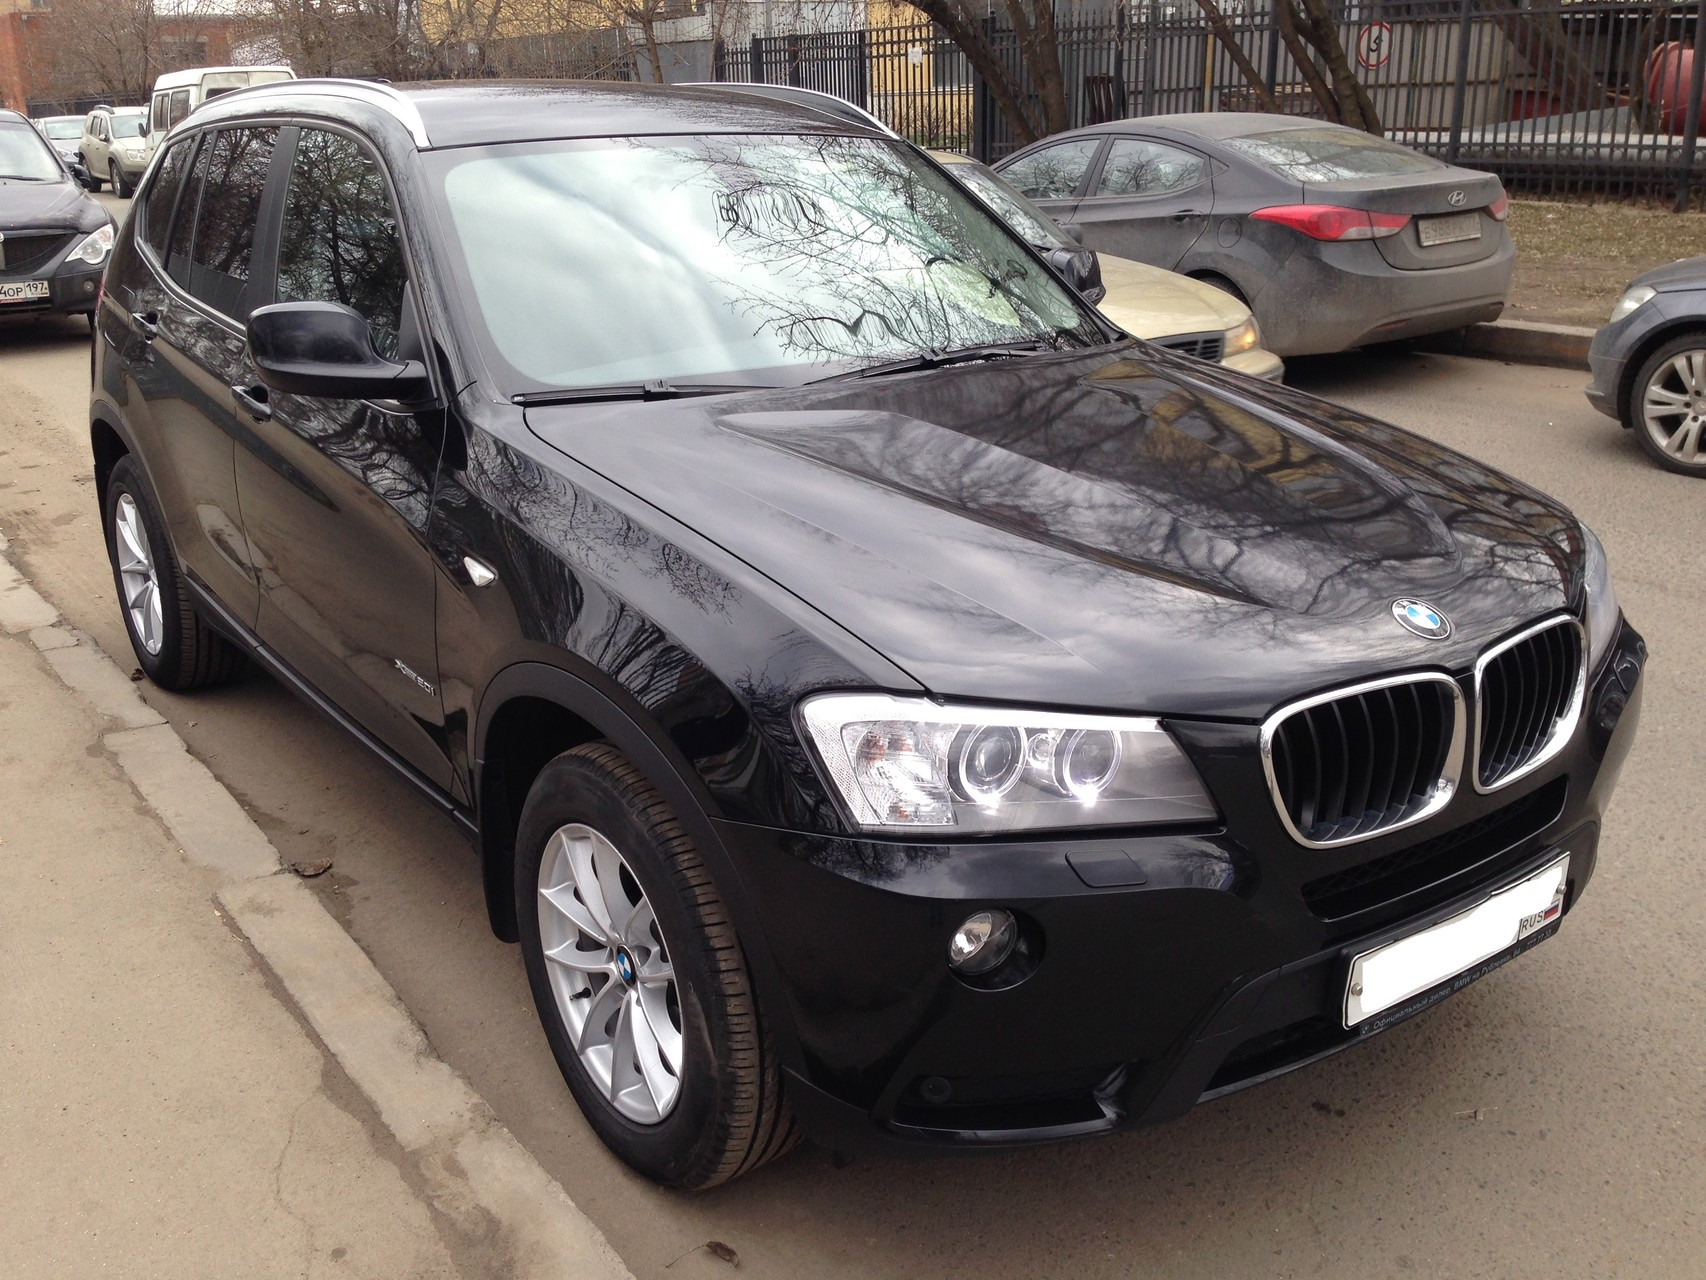 BMW X3 II (F25) Внедорожник 5 дв. 20i xDrive 2.0 AT (184 л.с.) 4WD Цена - 1 450 000руб